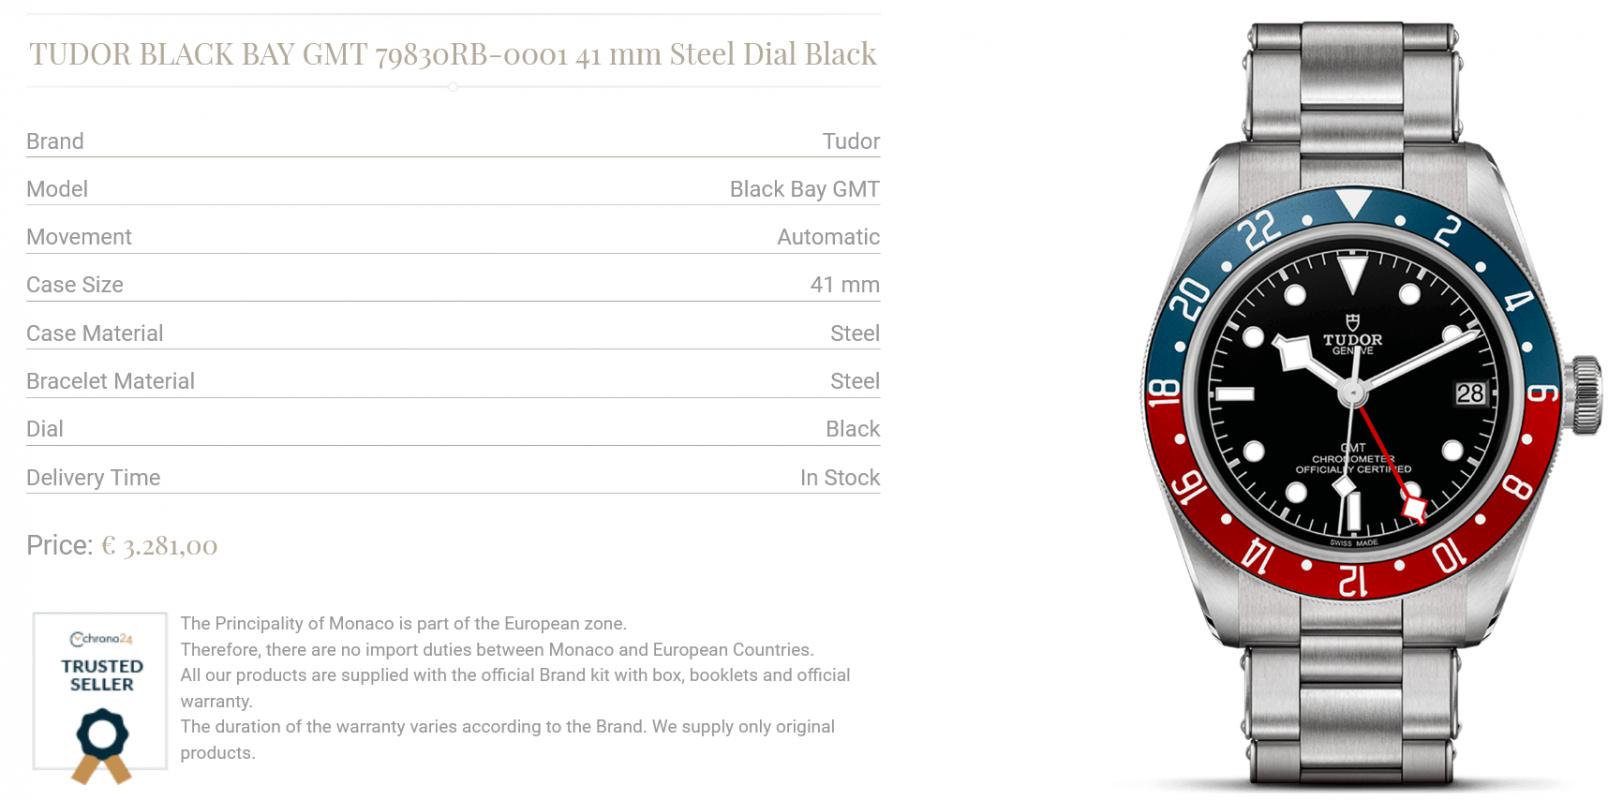 Screenshot 2021-07-18 at 16-03-31 Sale tudor black bay gmt tudor price.png